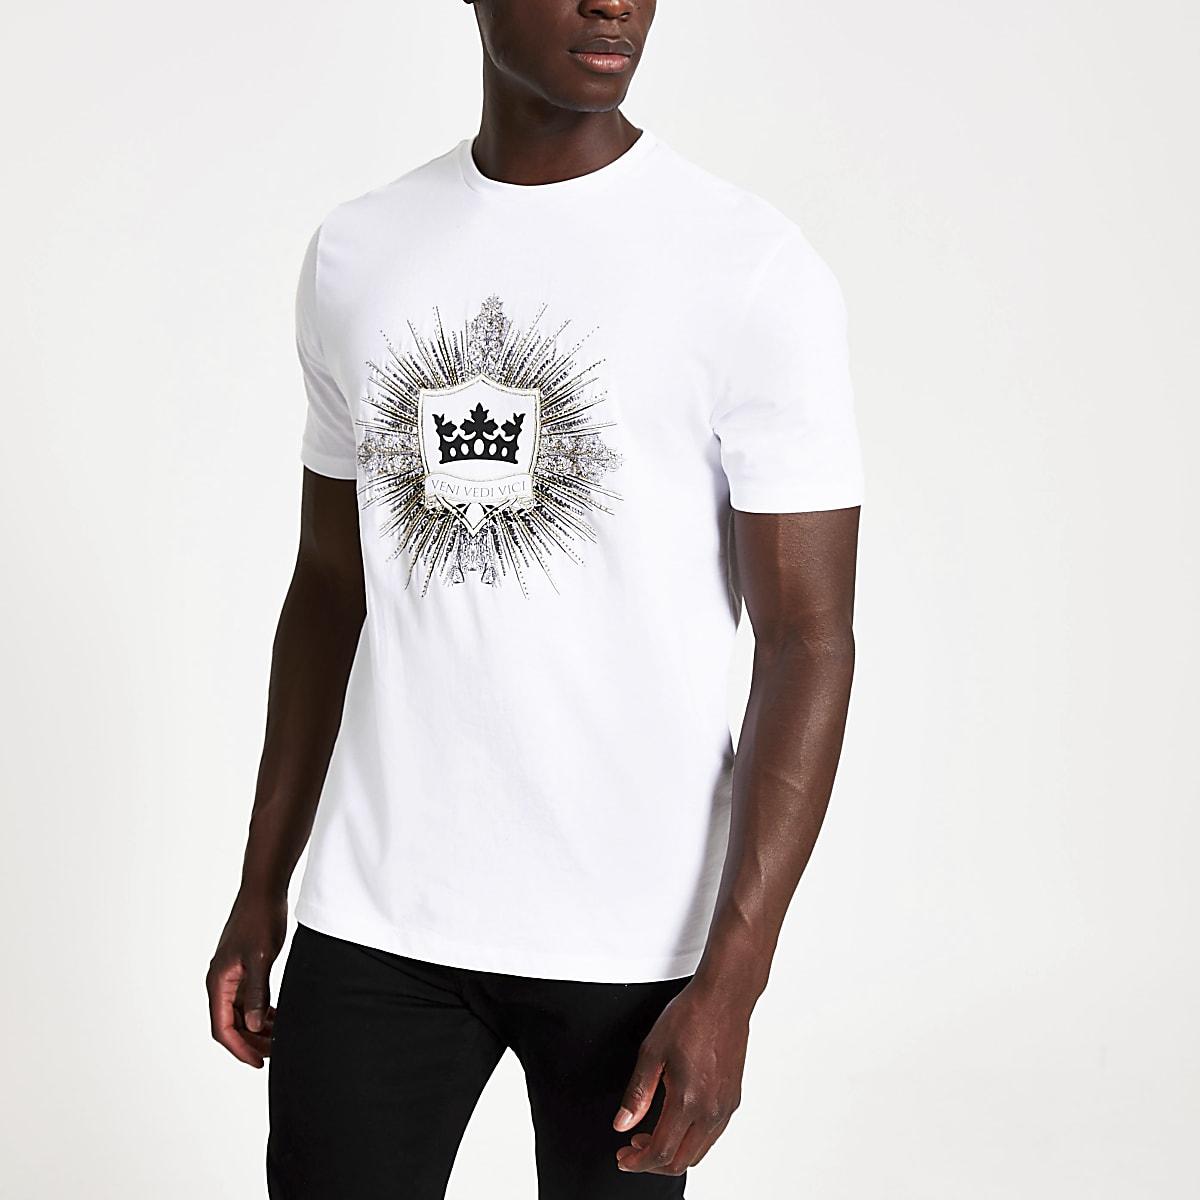 White 'Veni vedi vici' slim fit T-shirt